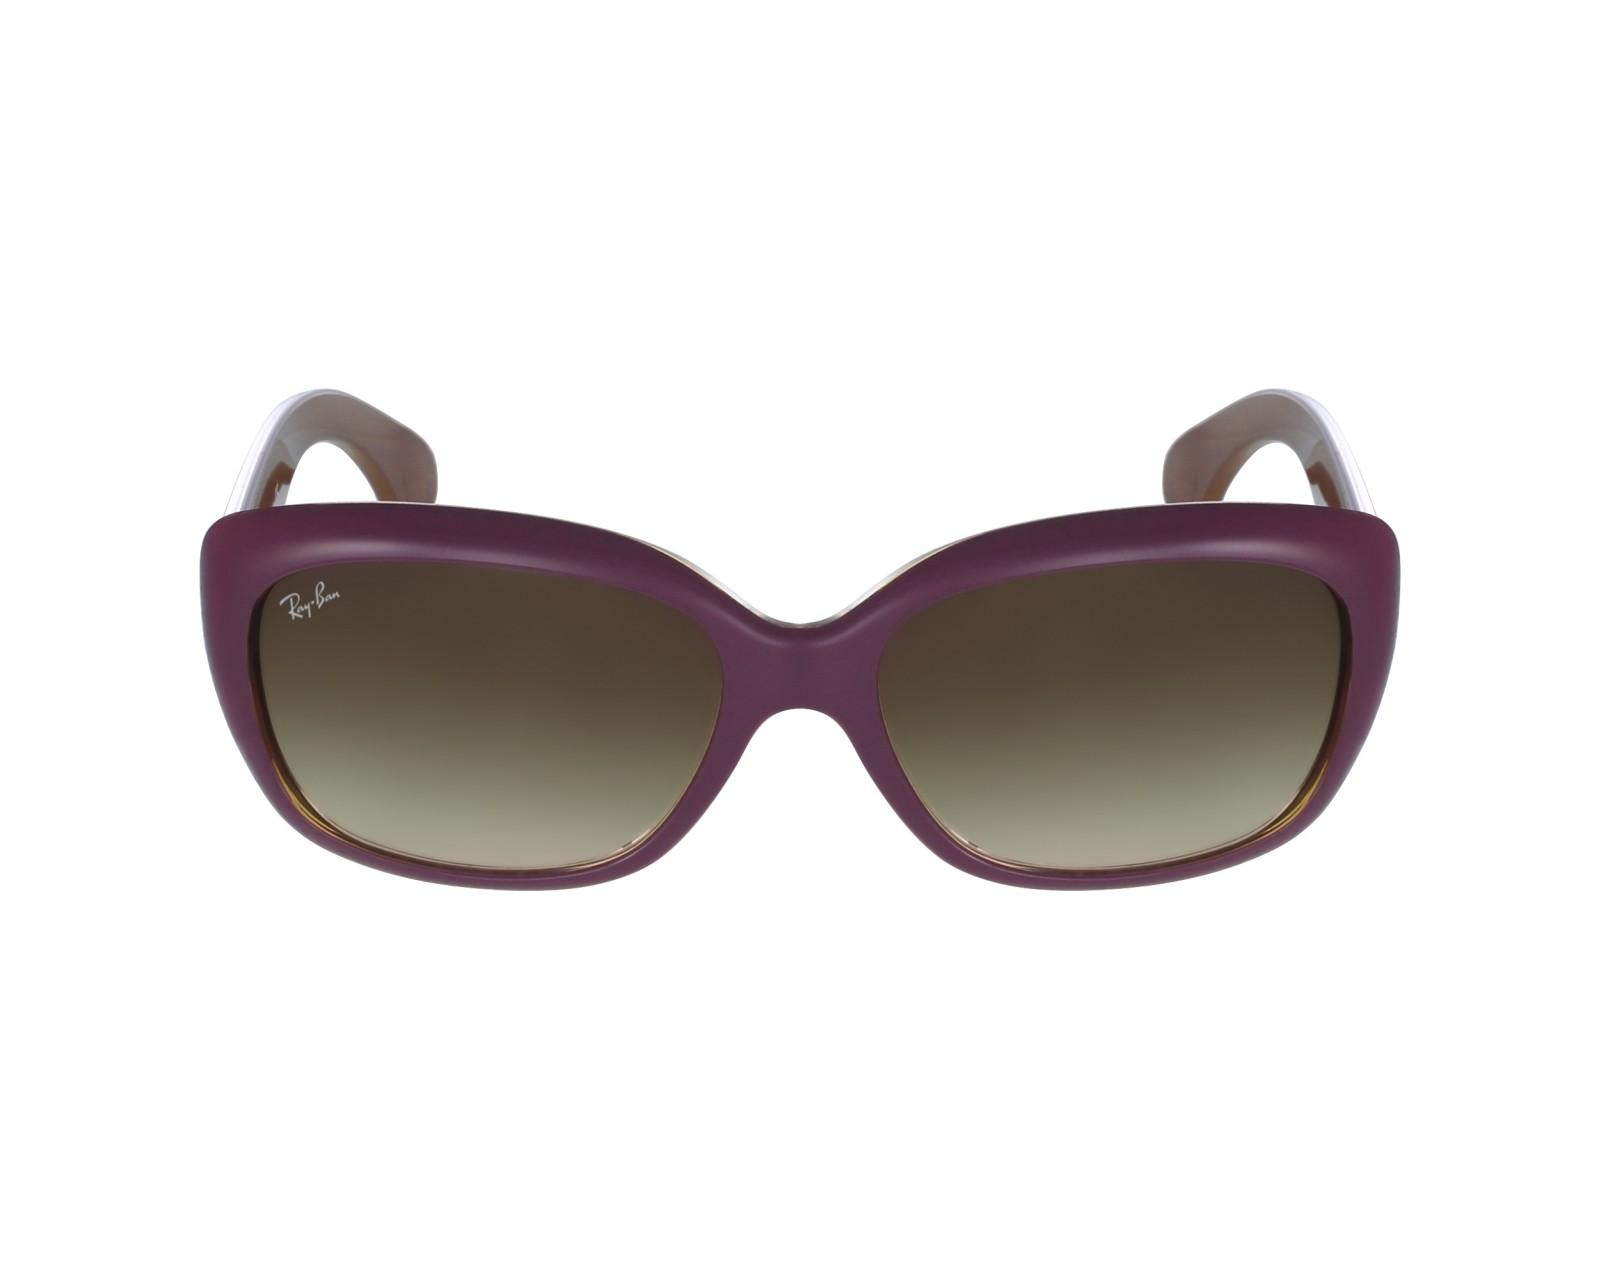 ray ban jackie ohh purple. Black Bedroom Furniture Sets. Home Design Ideas